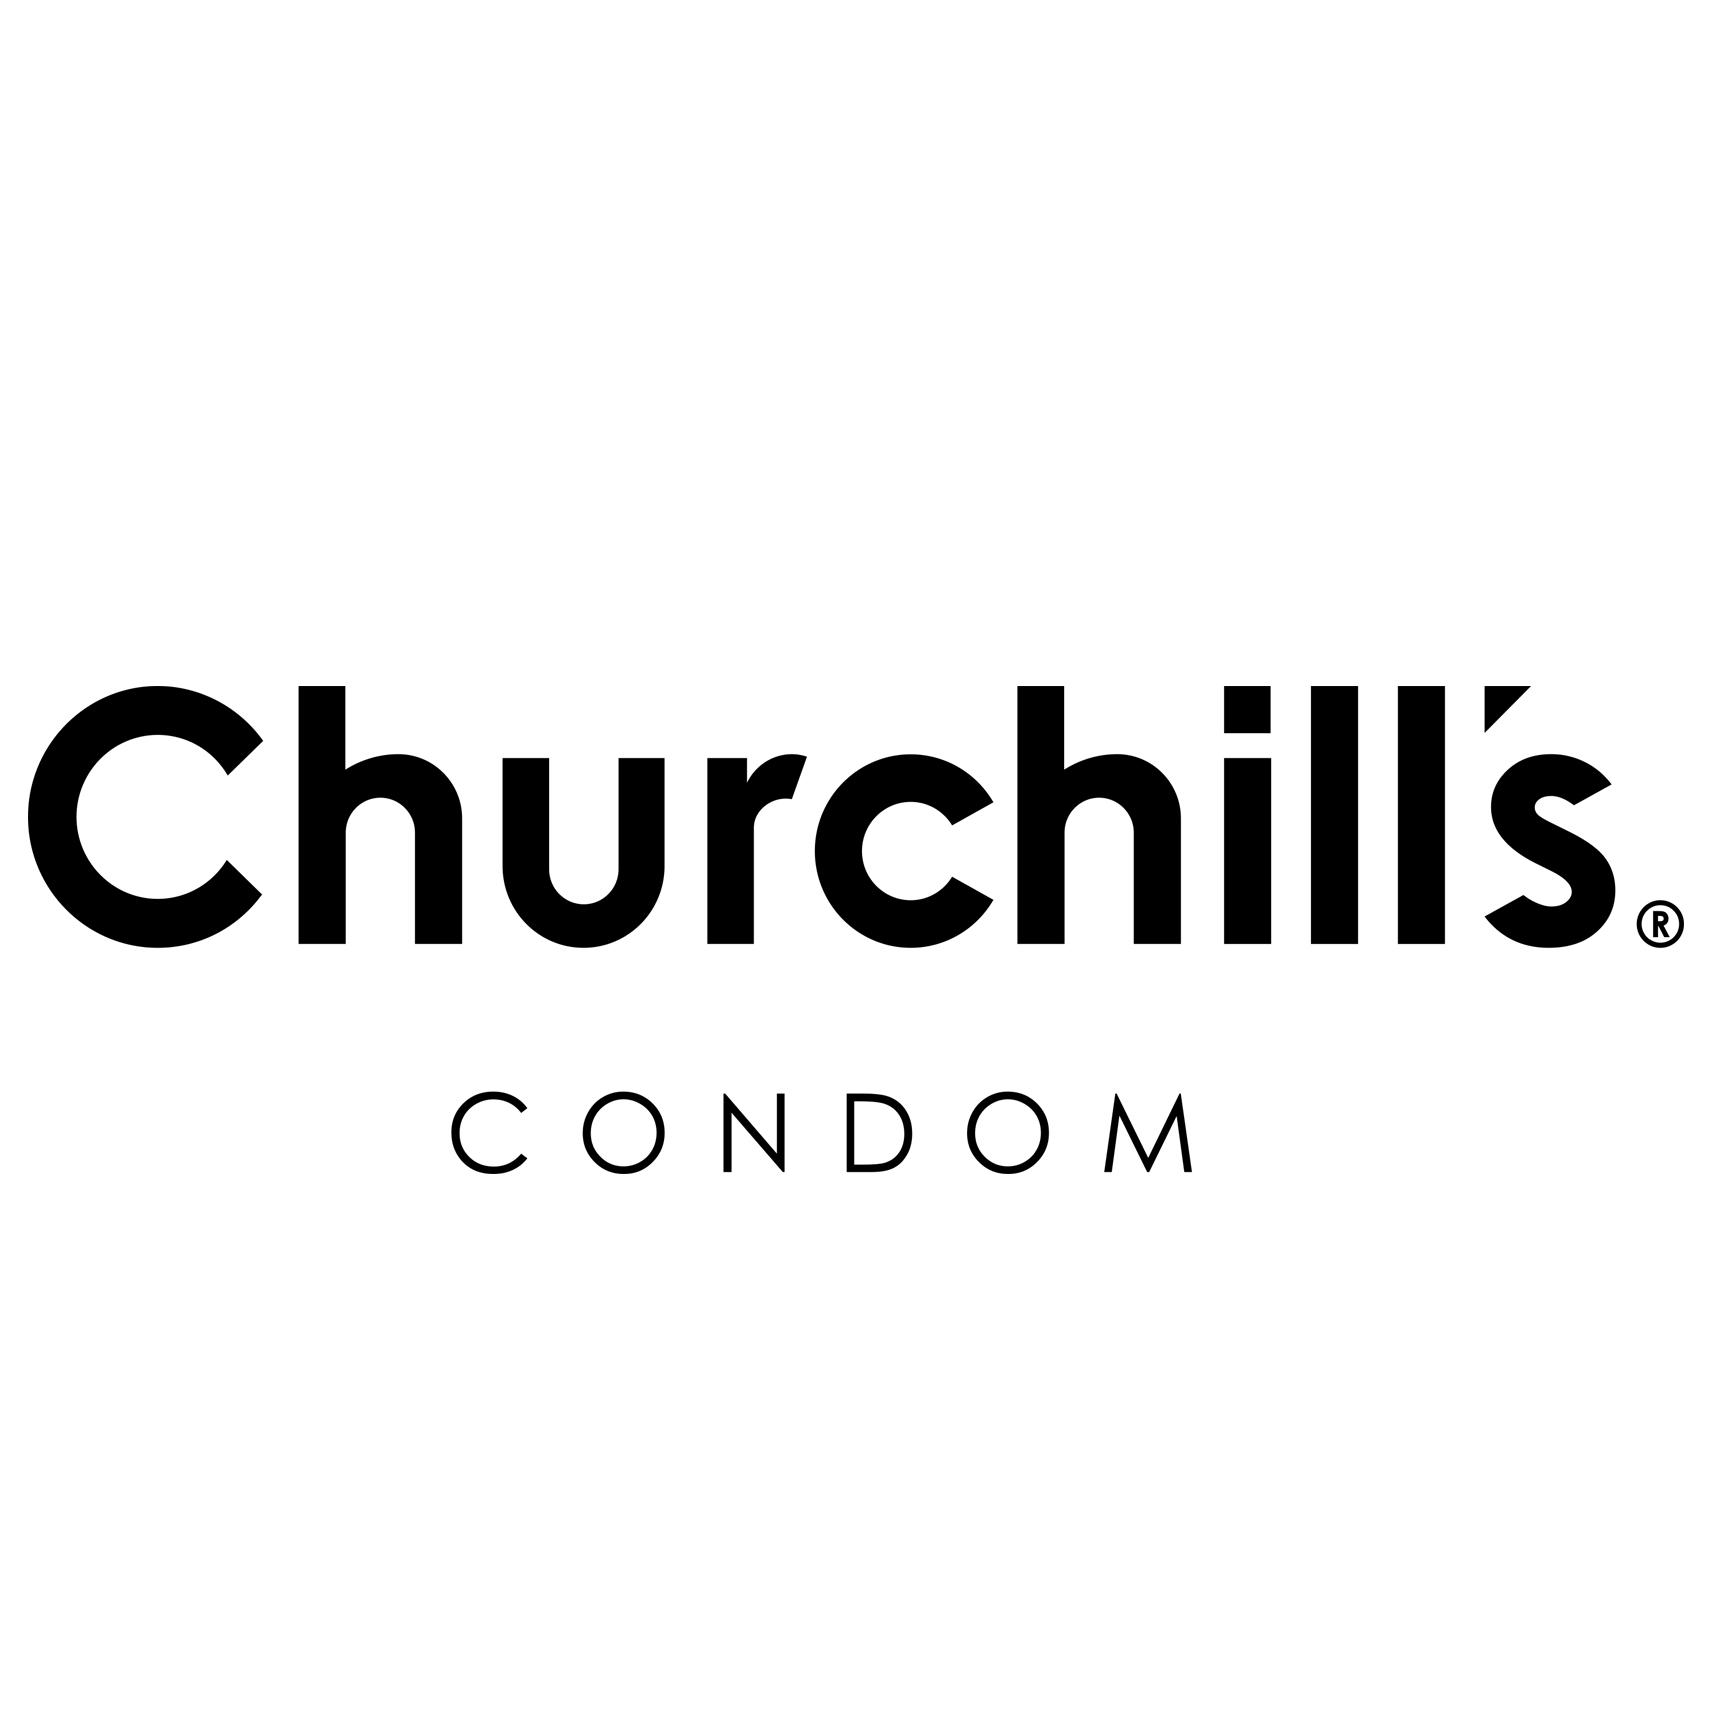 churchills - خرید لوازم آرایشی ارزان | فروشگاه اینترنتی میکاپ شینهوا ❤️